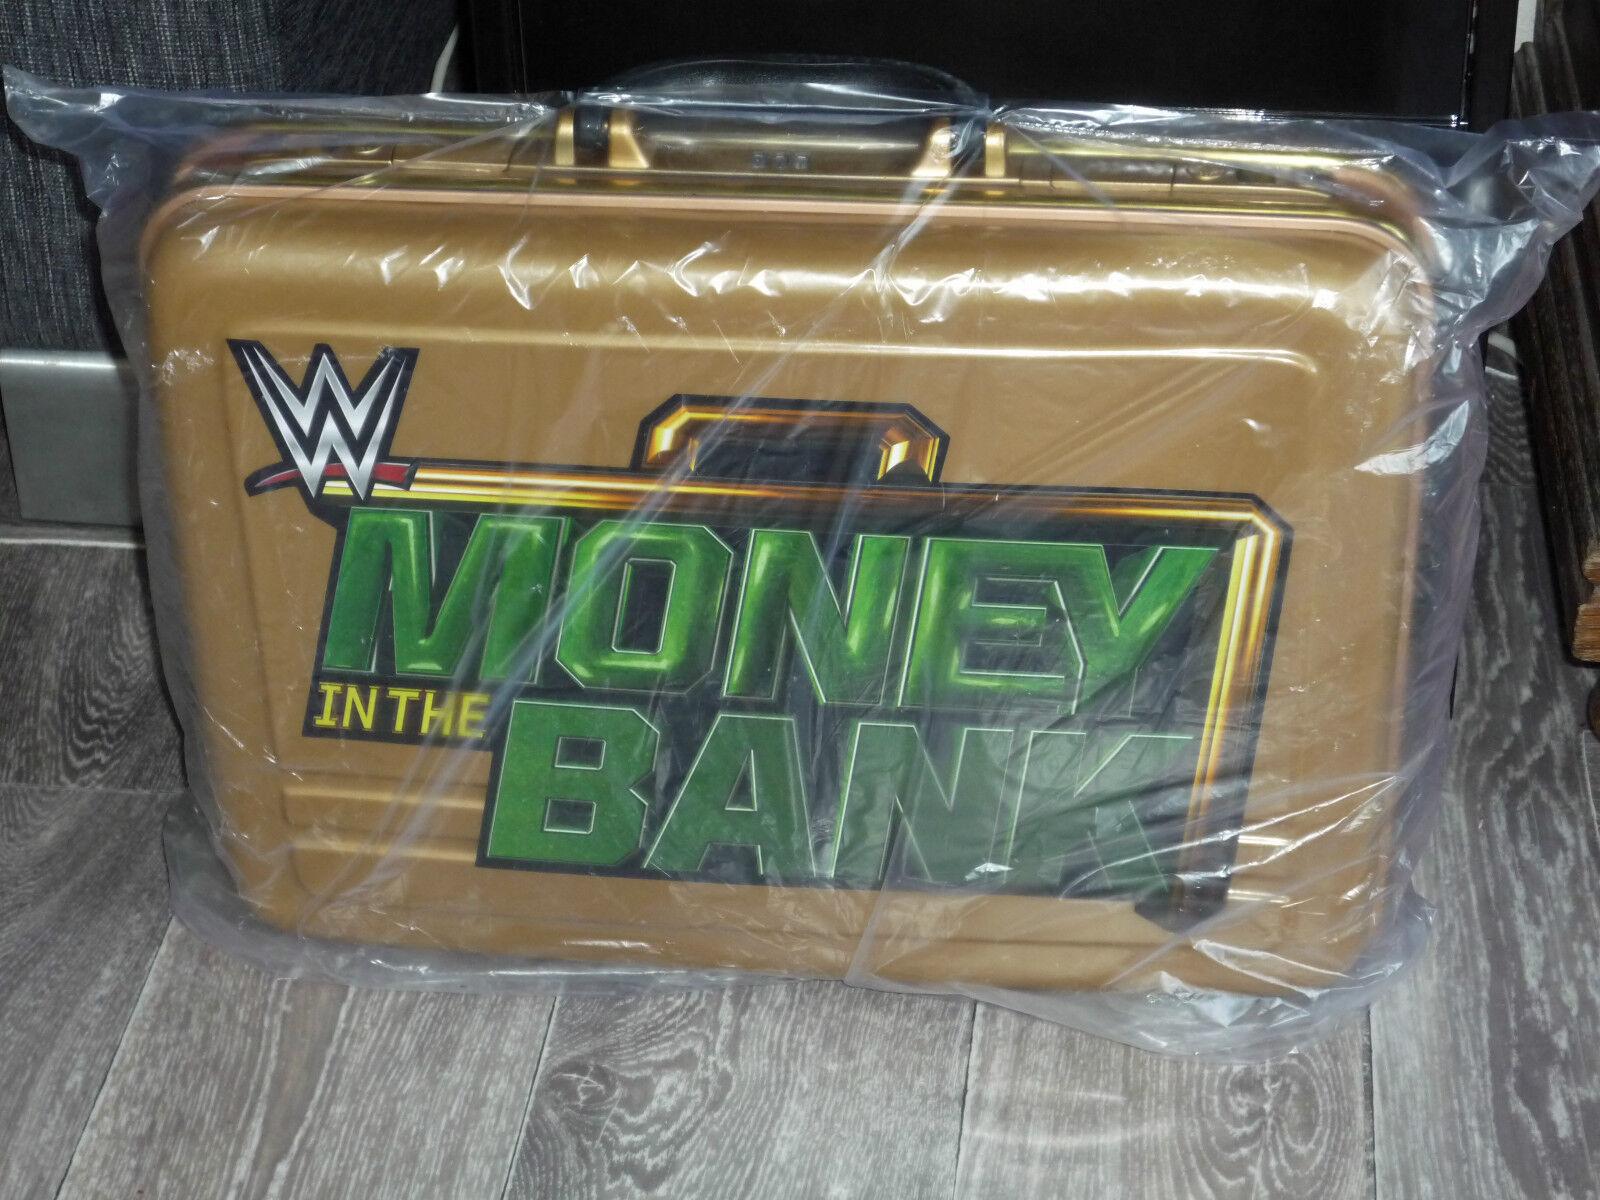 WWE Money In The Wrestlemania Bank Briefcase Wrestlemania The Axxess 31 MITB Wrestle Seth Rollins 98d6b5